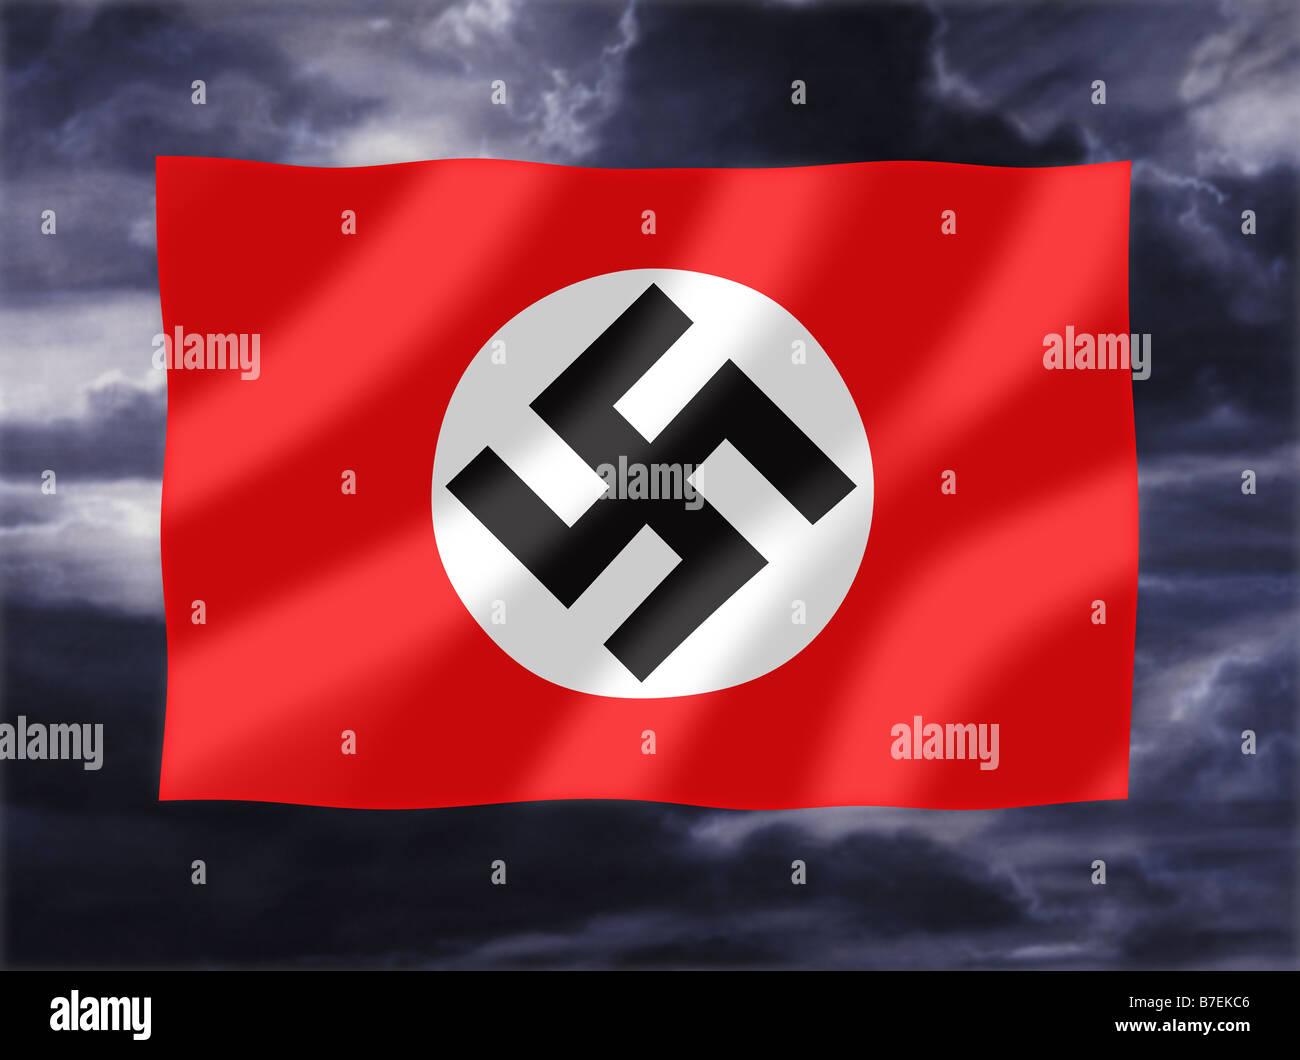 Nazi symbol stock photos nazi symbol stock images alamy nazi flag waving against stormy sky stock image biocorpaavc Image collections